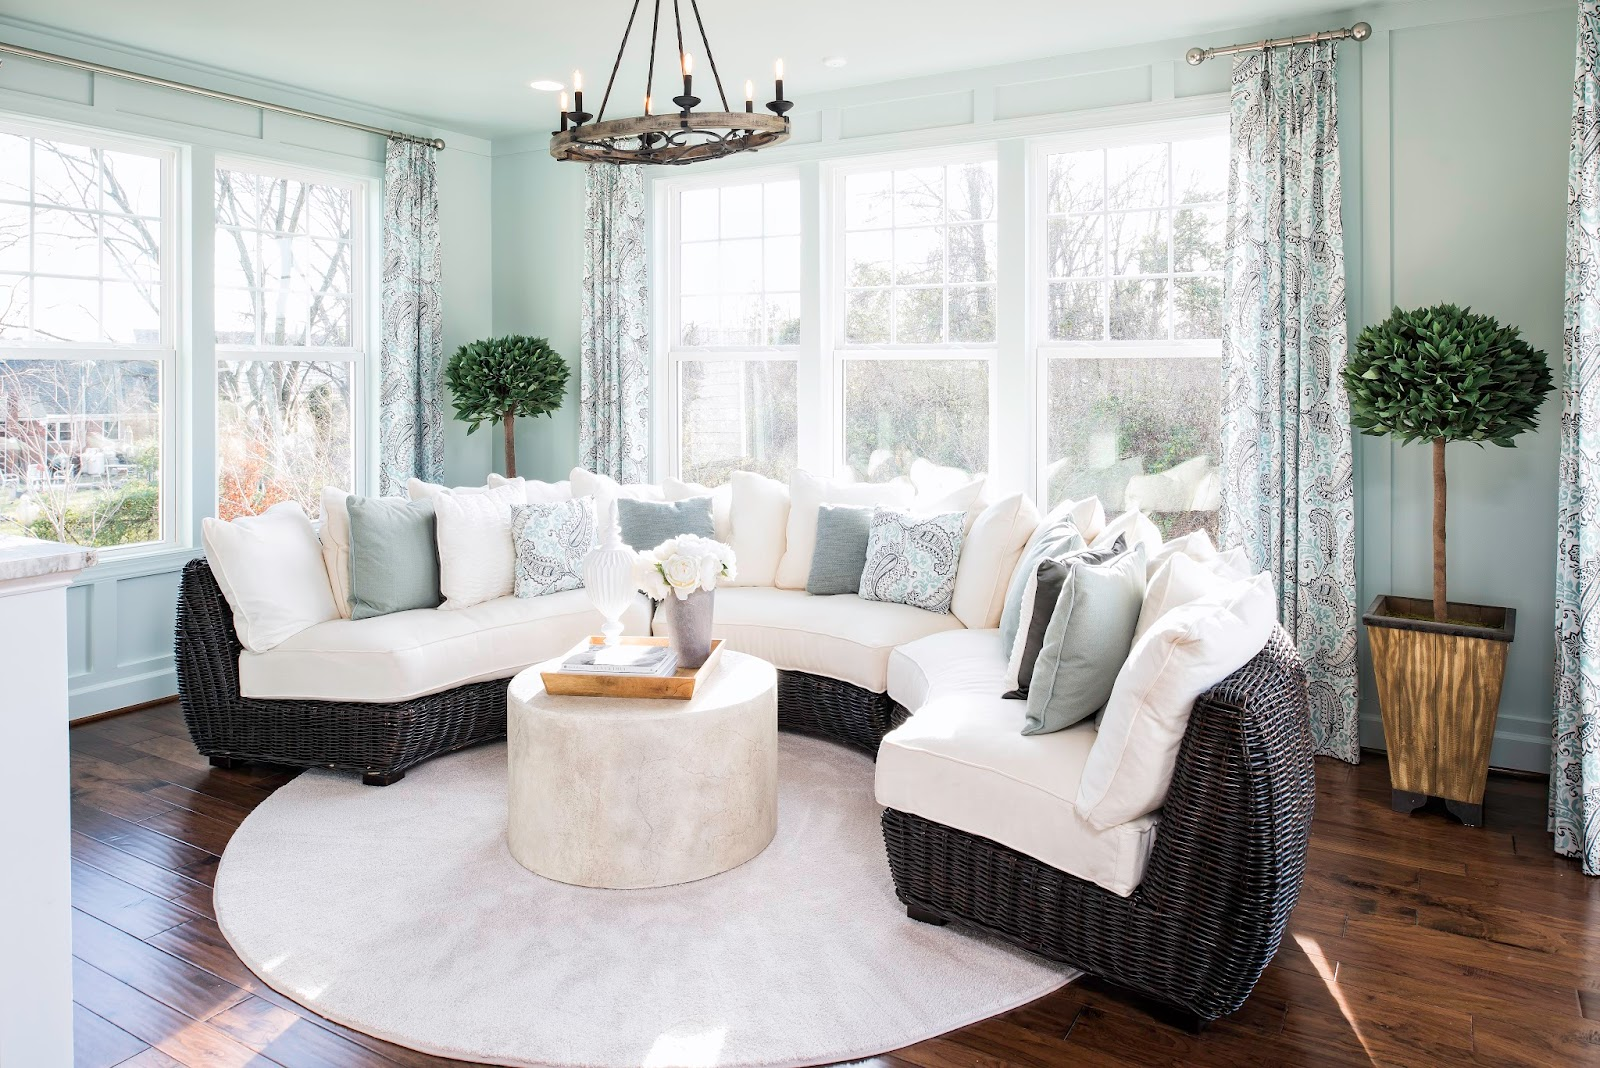 Model home furniture in manassas va